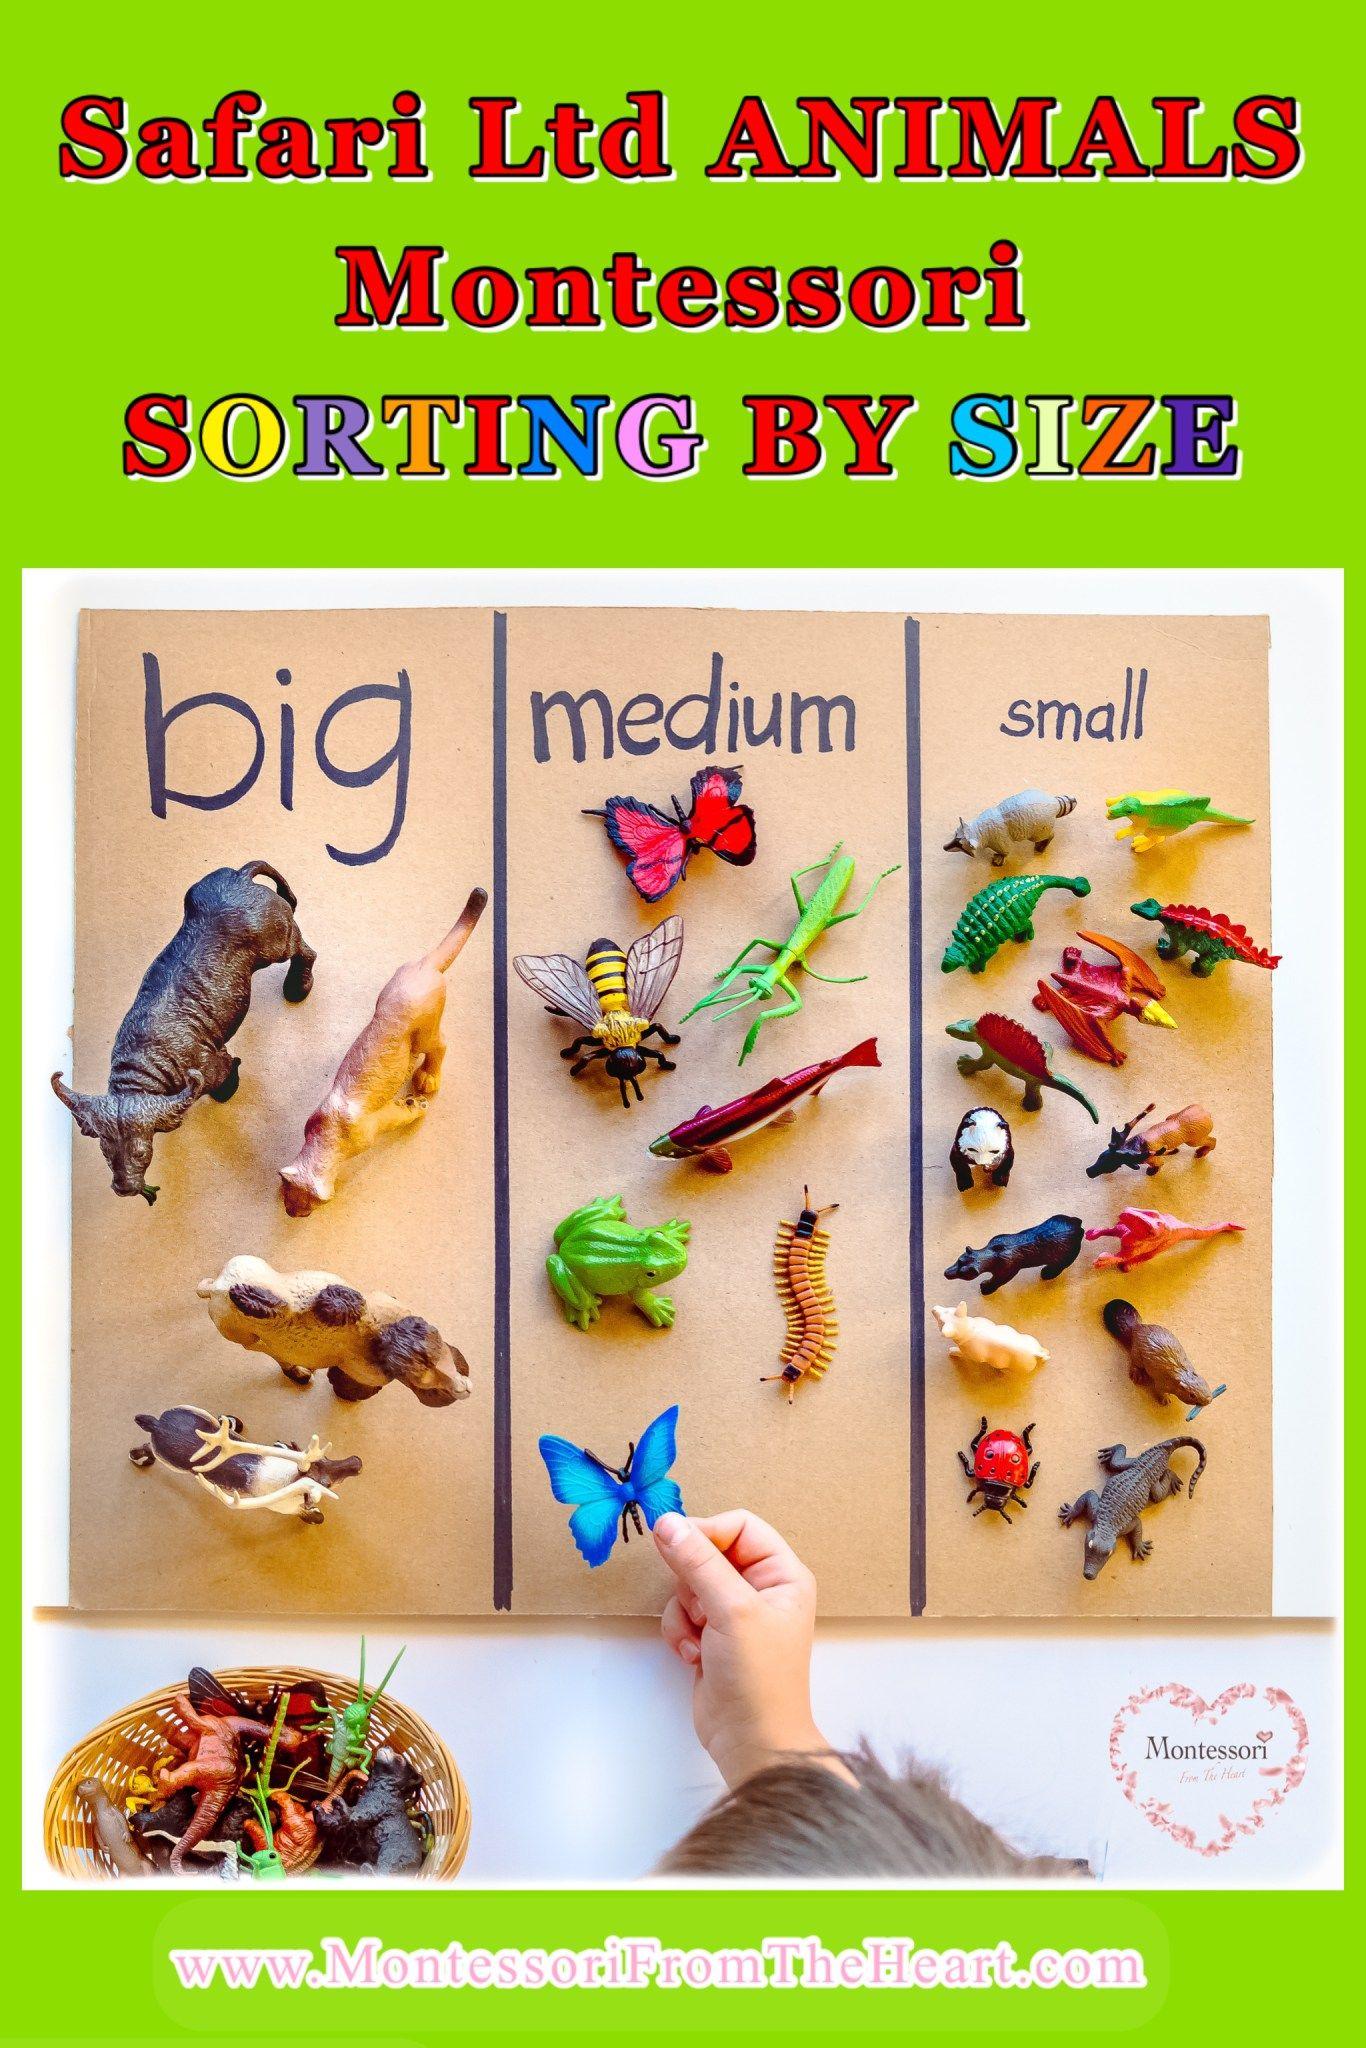 Safariltd Animal Size Sorting